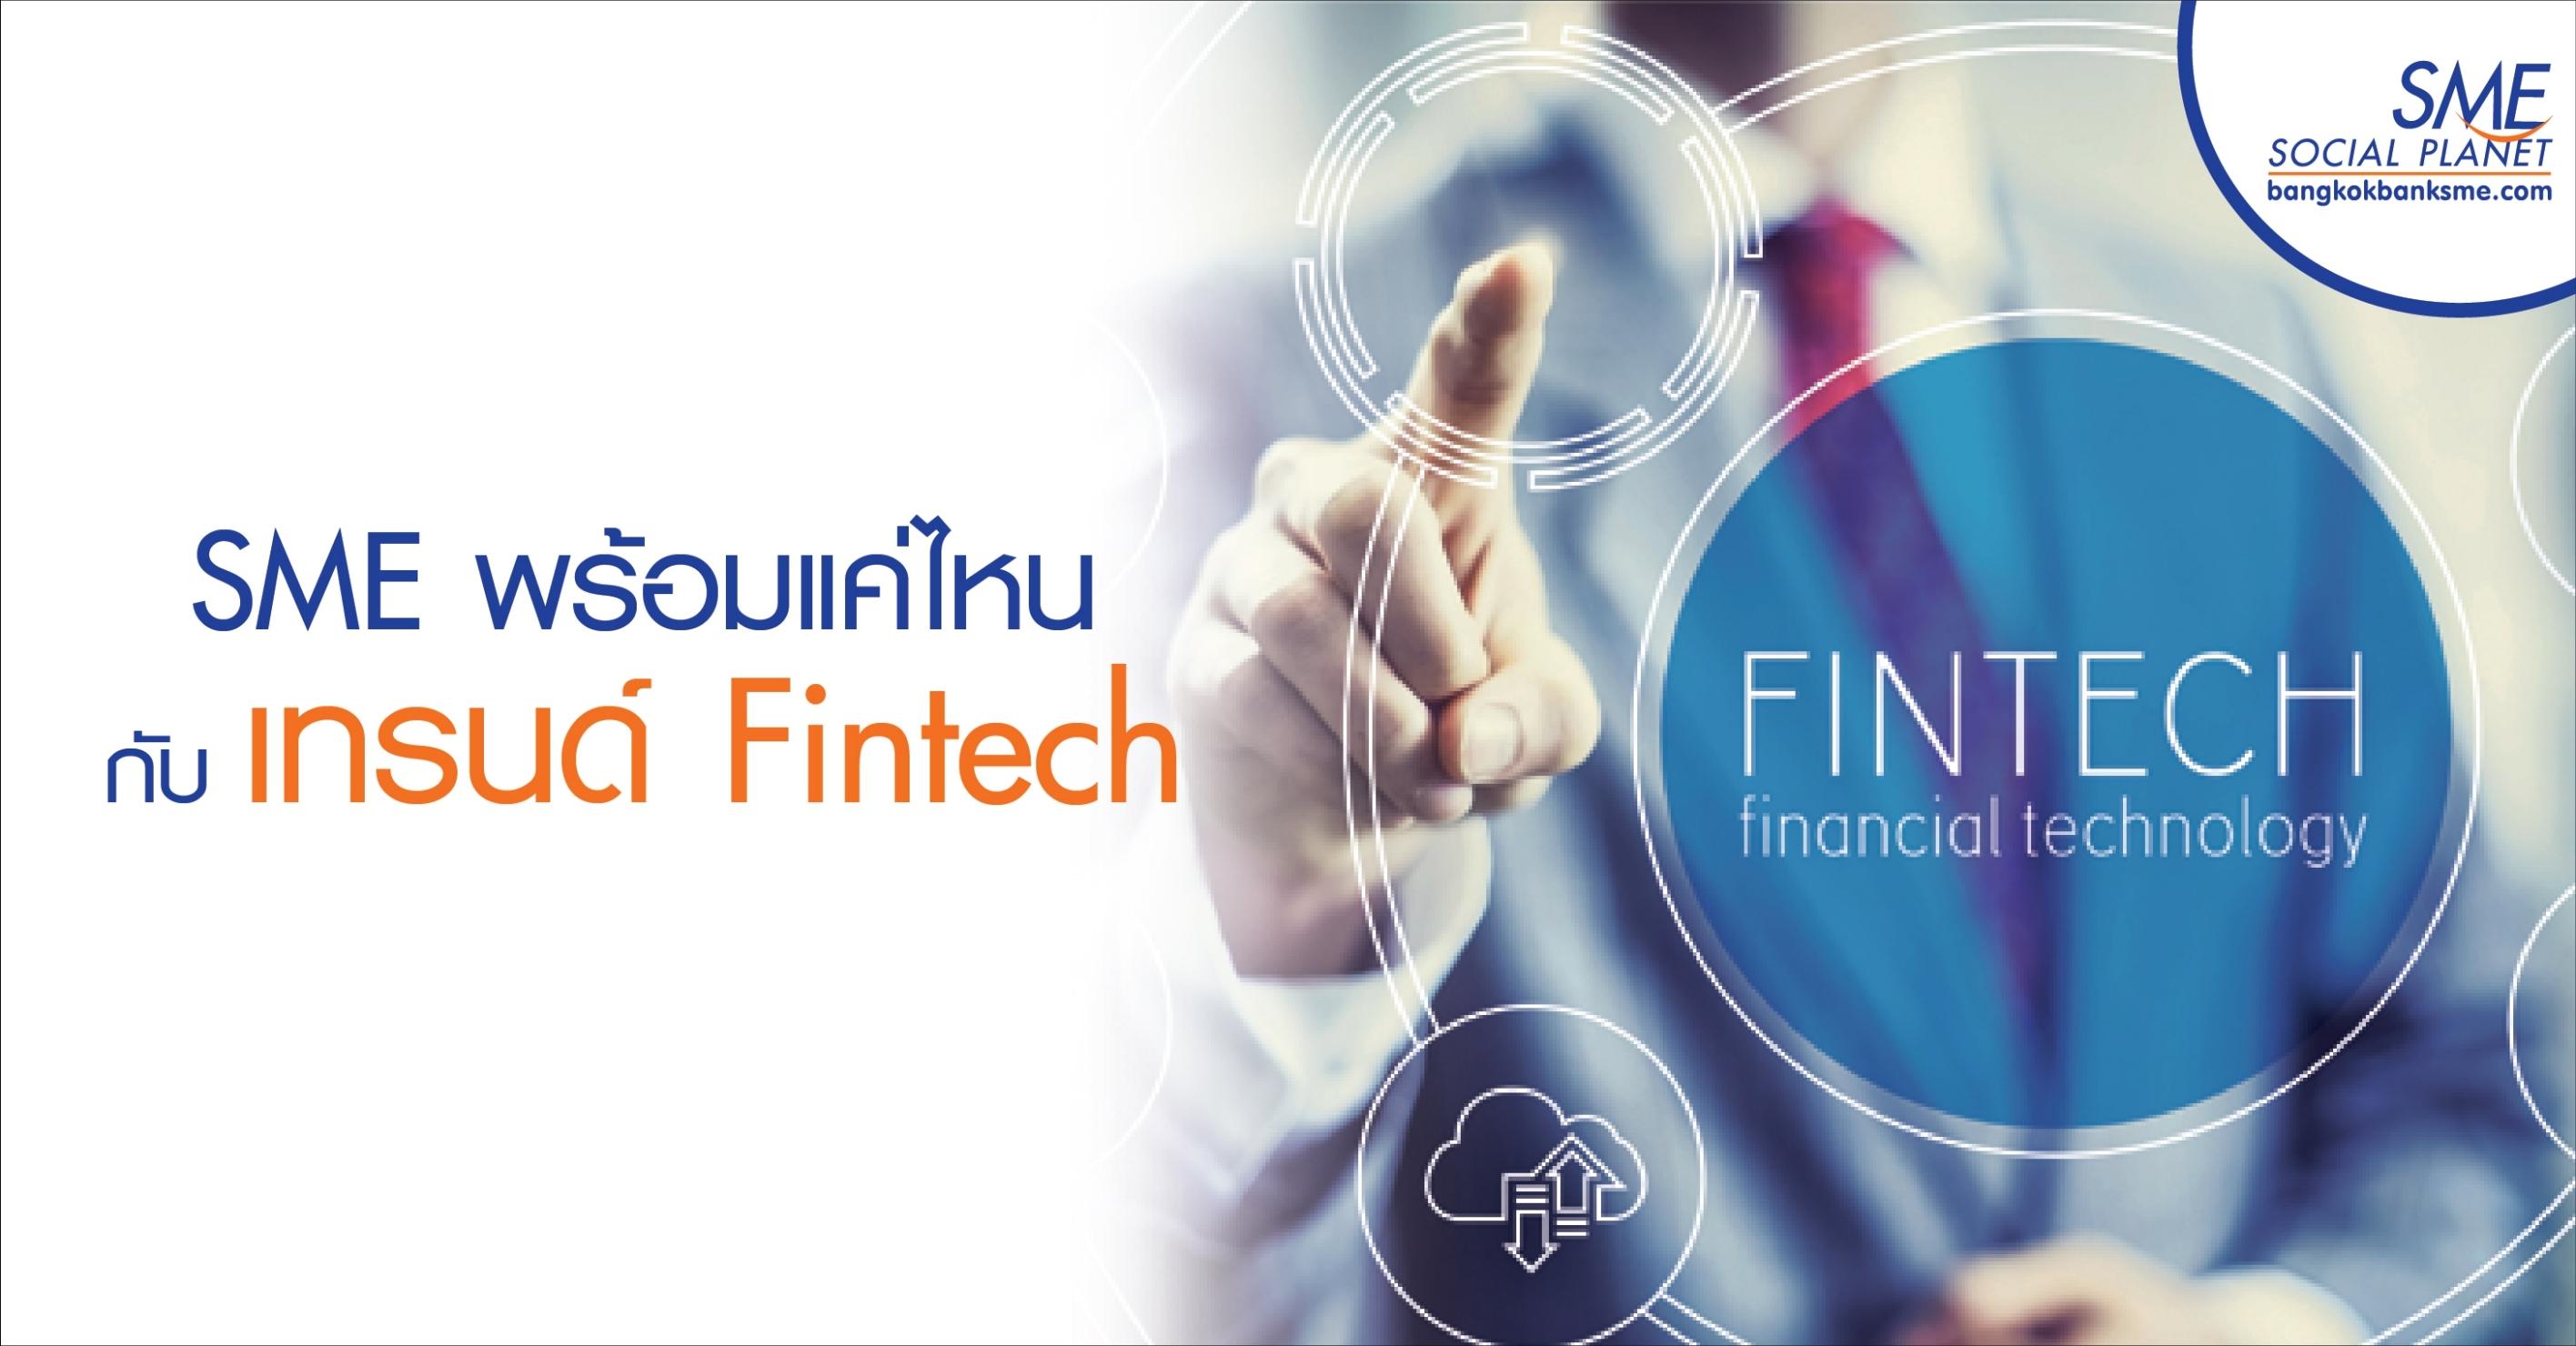 SME พร้อมแค่ไหนกับเทรนด์ Fintech